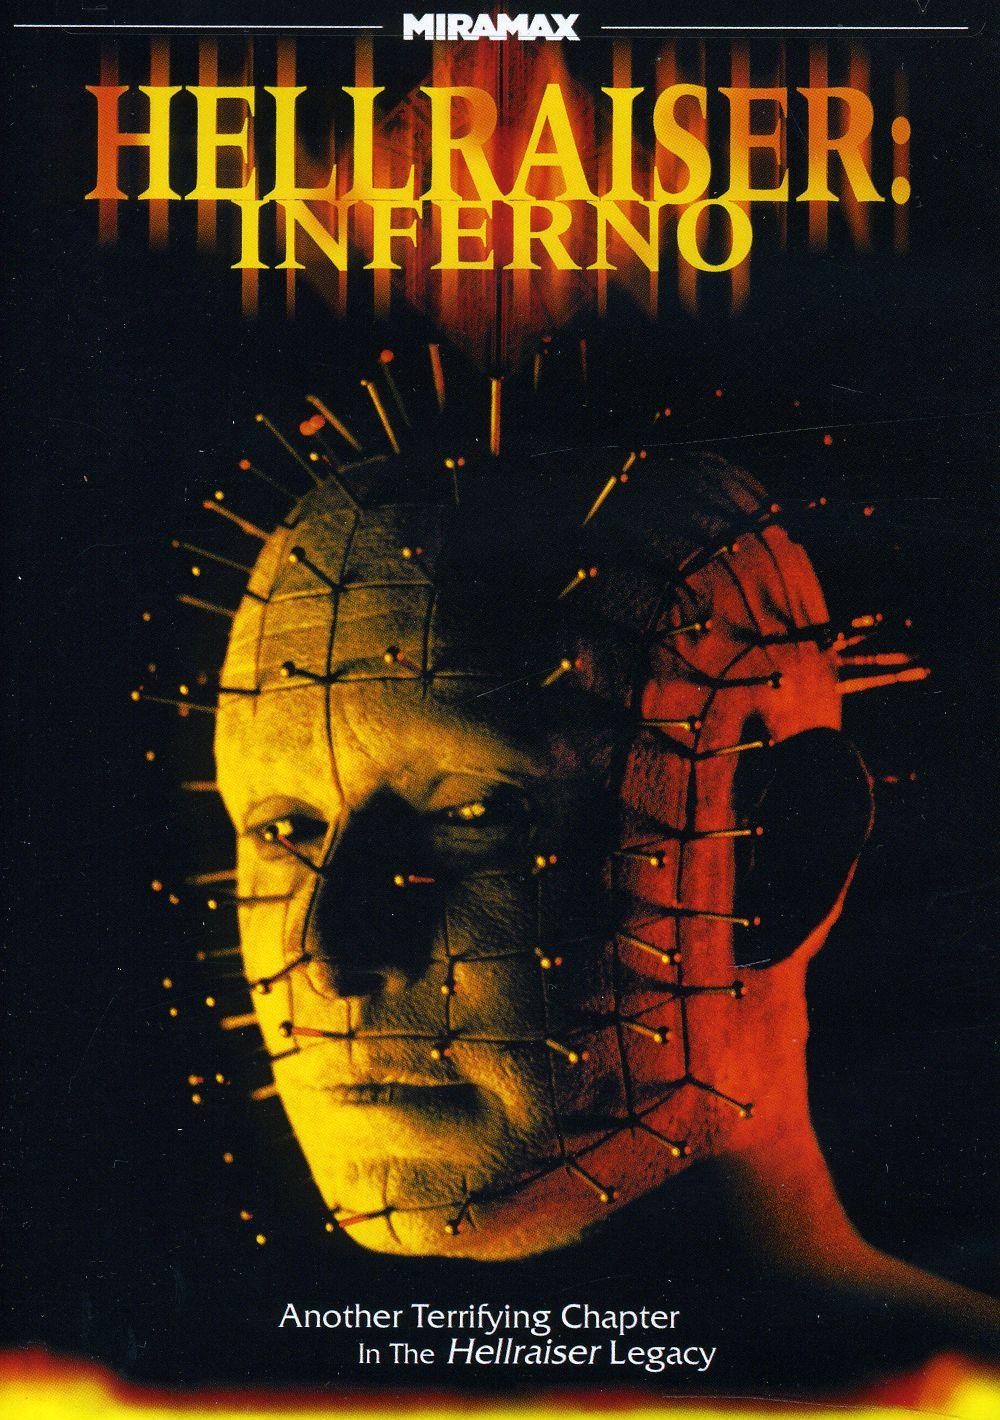 Hellraiser_Inferno_Poster